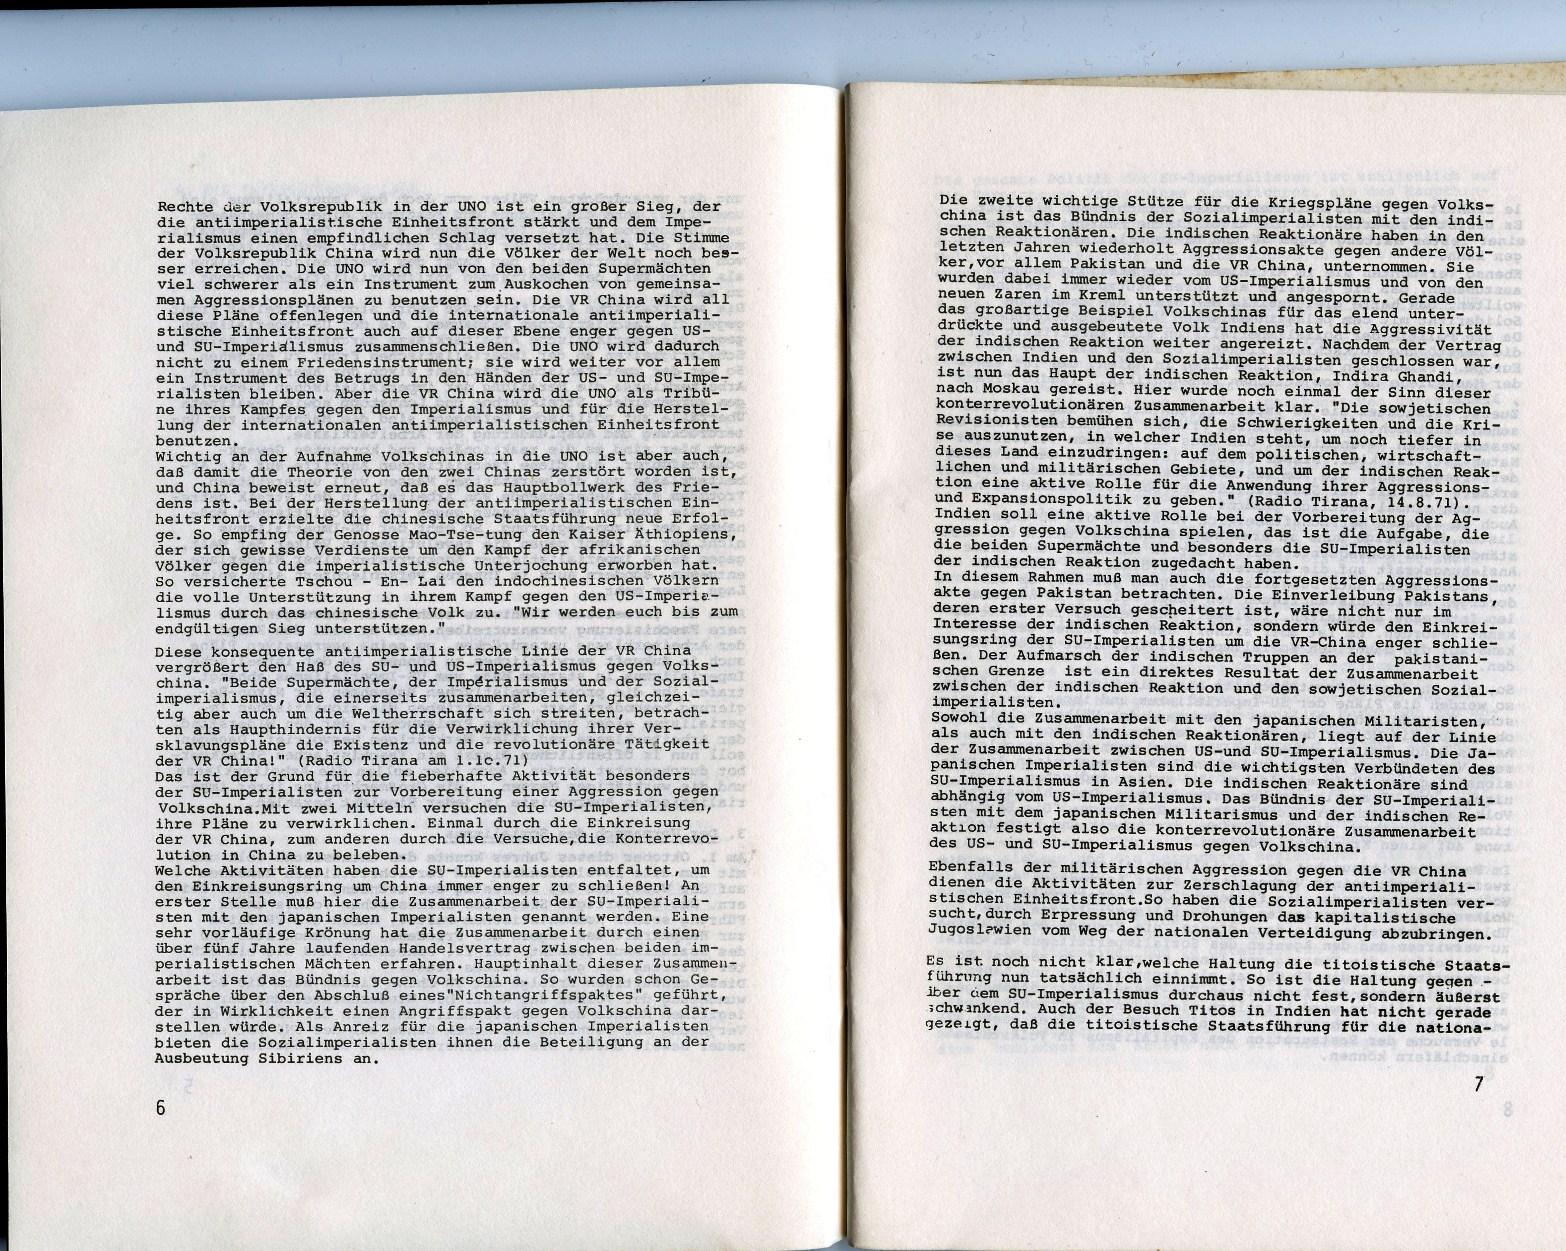 ZB_Parteiarbeiter_1971_09_04